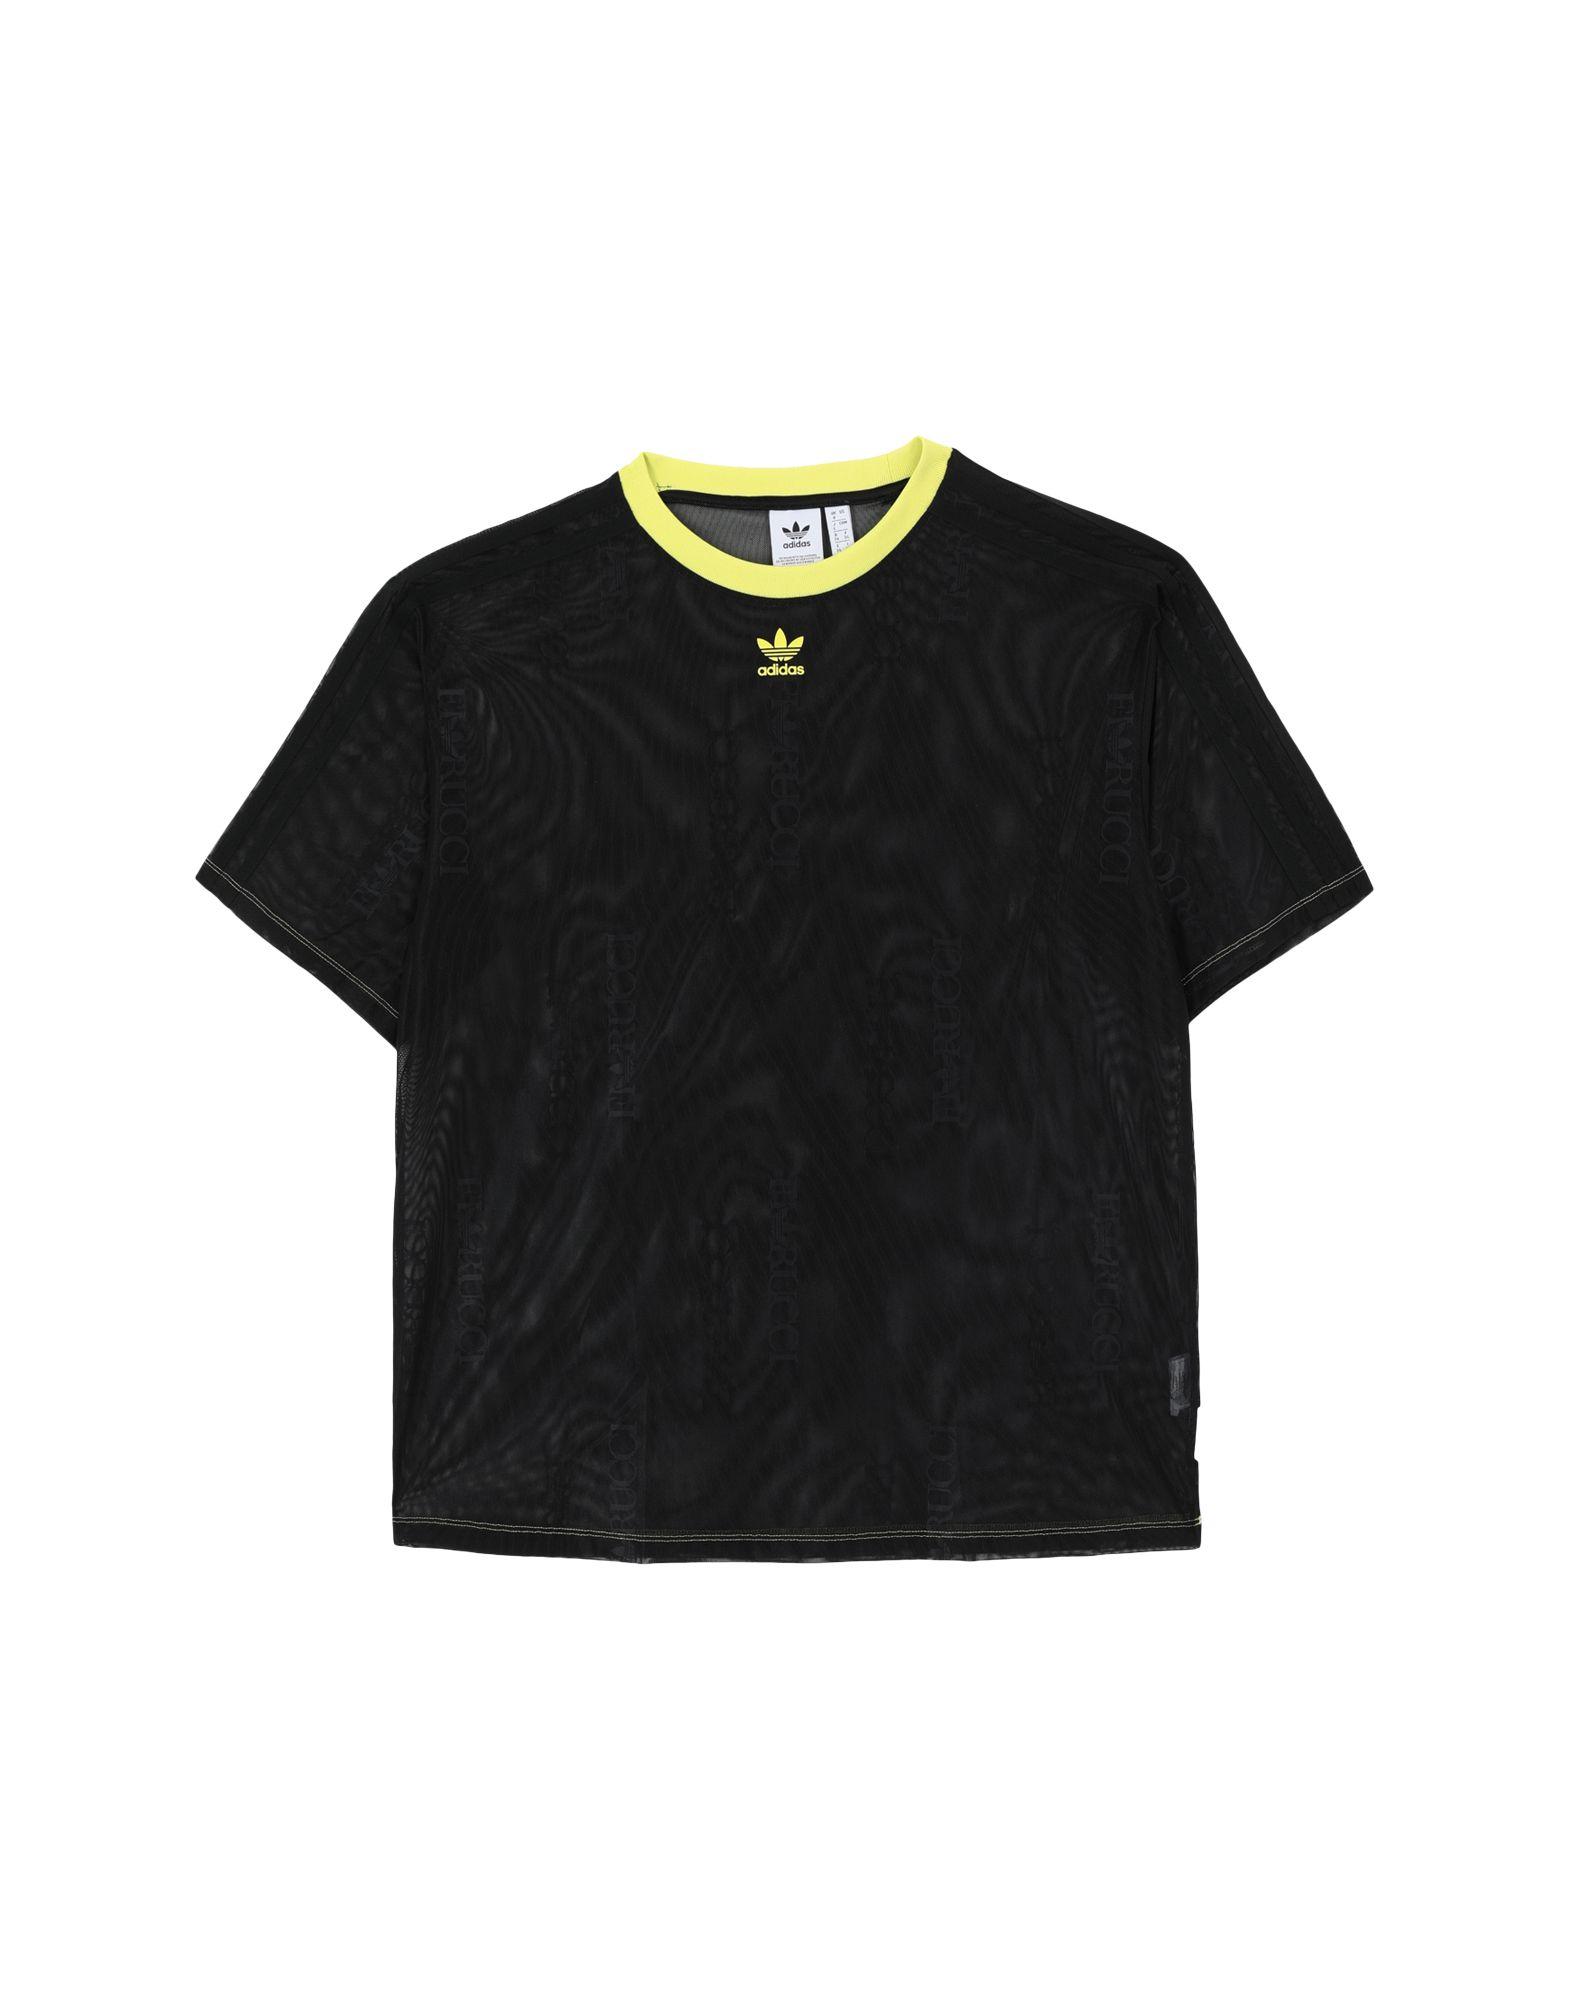 ADIDAS ORIGINALS x FIORUCCI Футболка adidas originals футболка